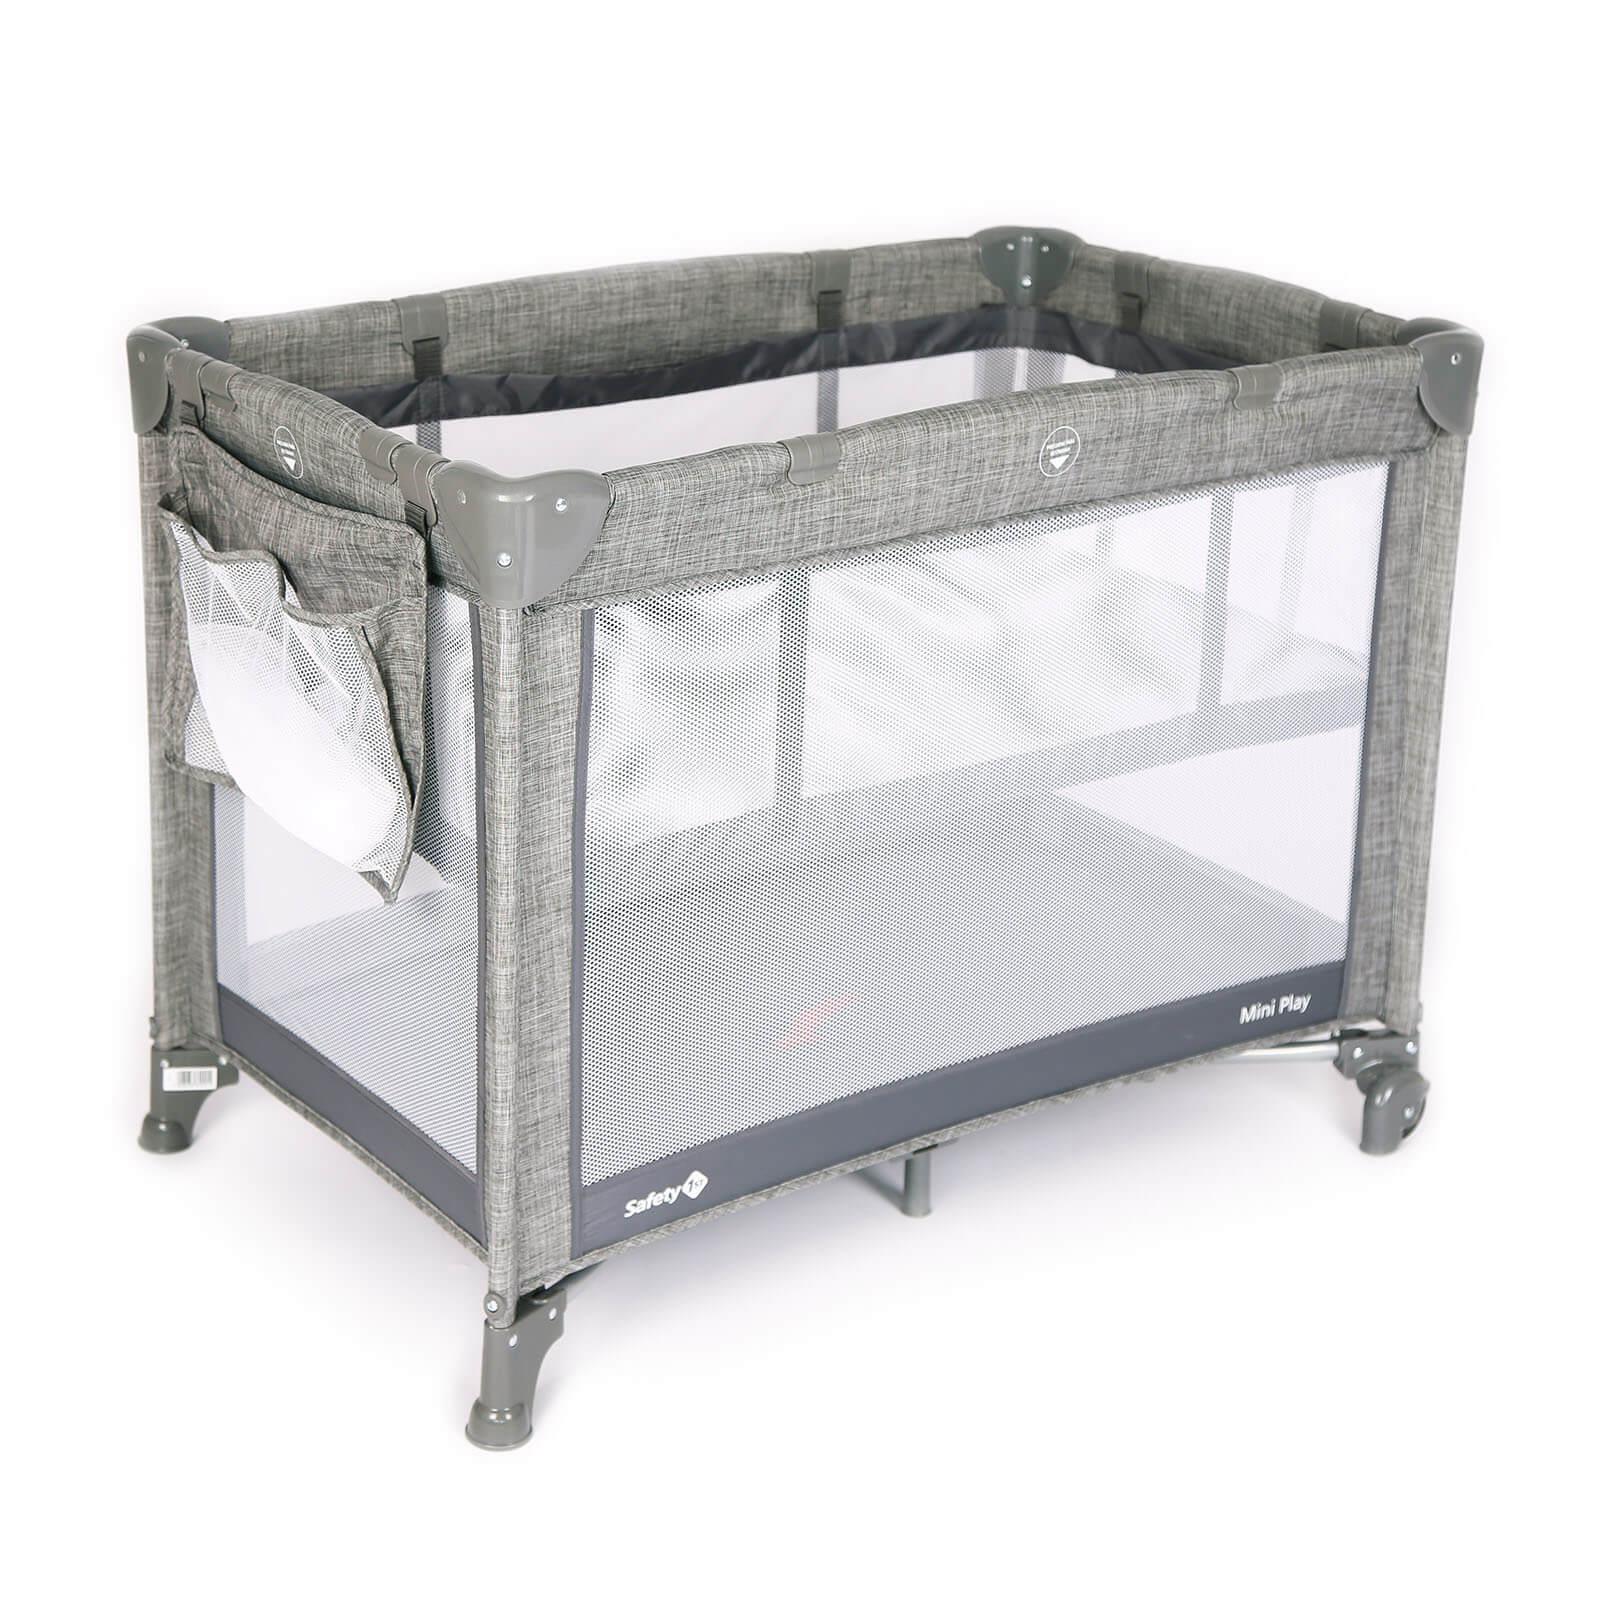 Berço Mini Play Grey - Safety 1st Ref C55-b